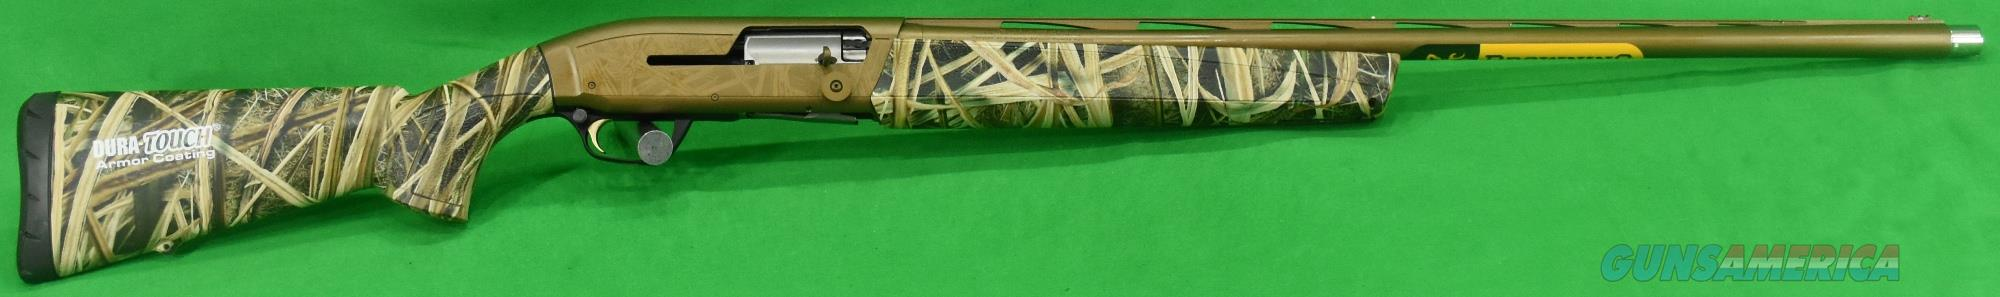 Maxus Wicked Wing MOSGB 12Ga 28-3.5In 011670204  Guns > Shotguns > Browning Shotguns > Autoloaders > Hunting